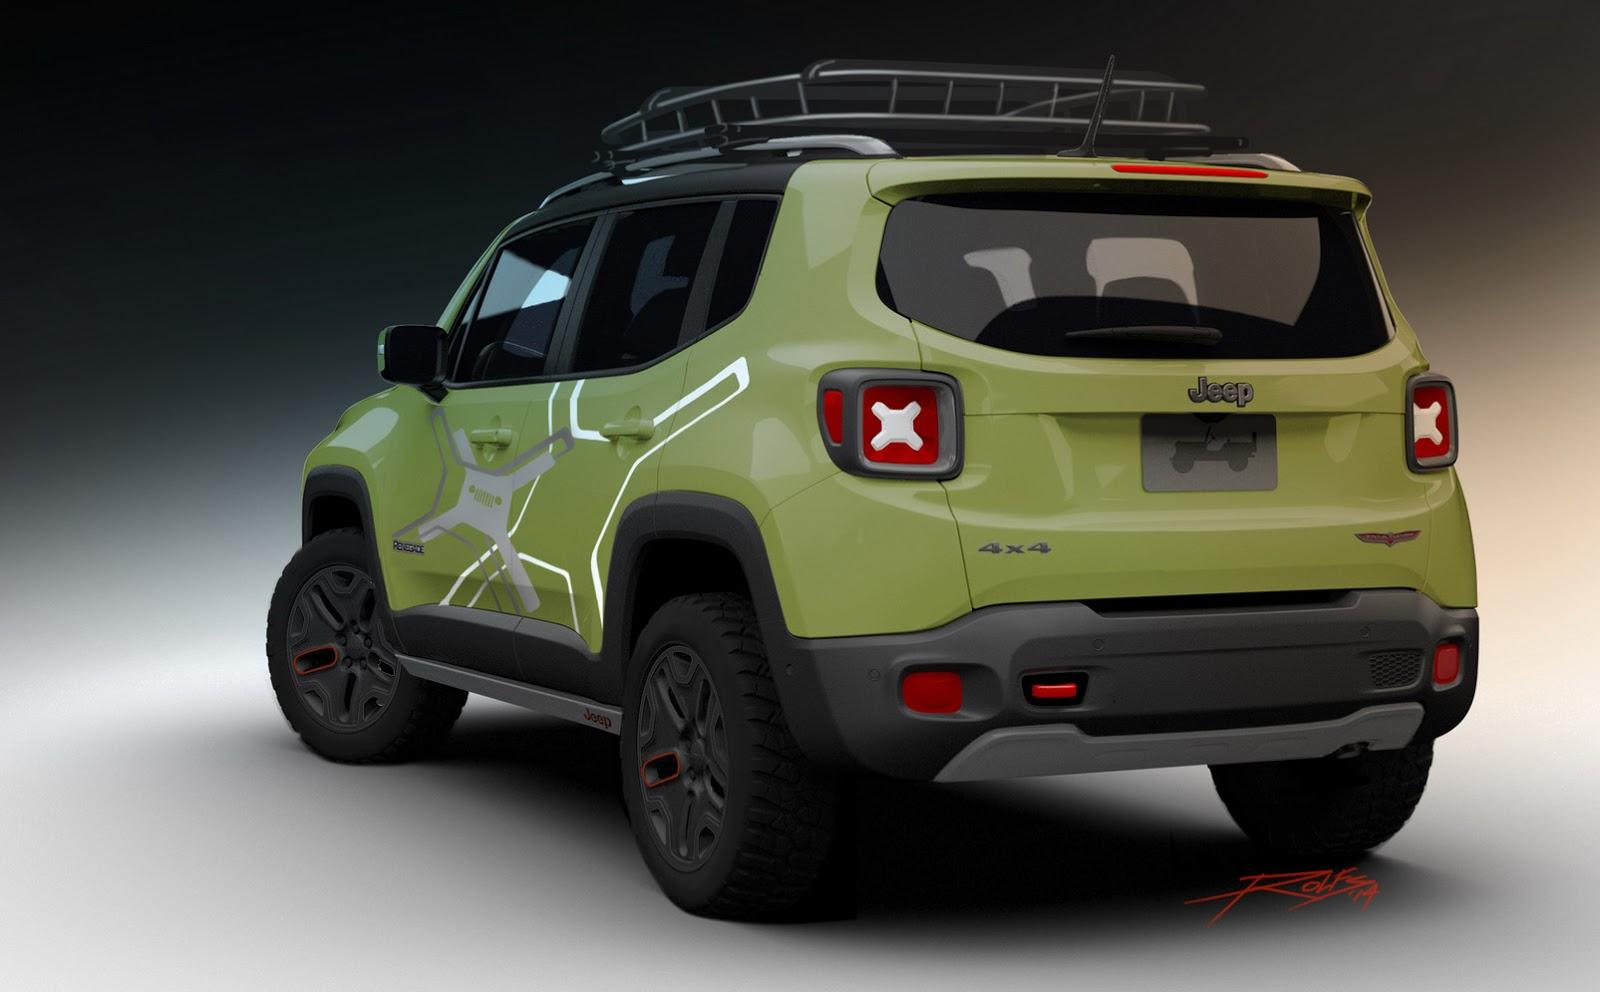 mopar preps a pair of jeep renegade concepts for naias. Black Bedroom Furniture Sets. Home Design Ideas